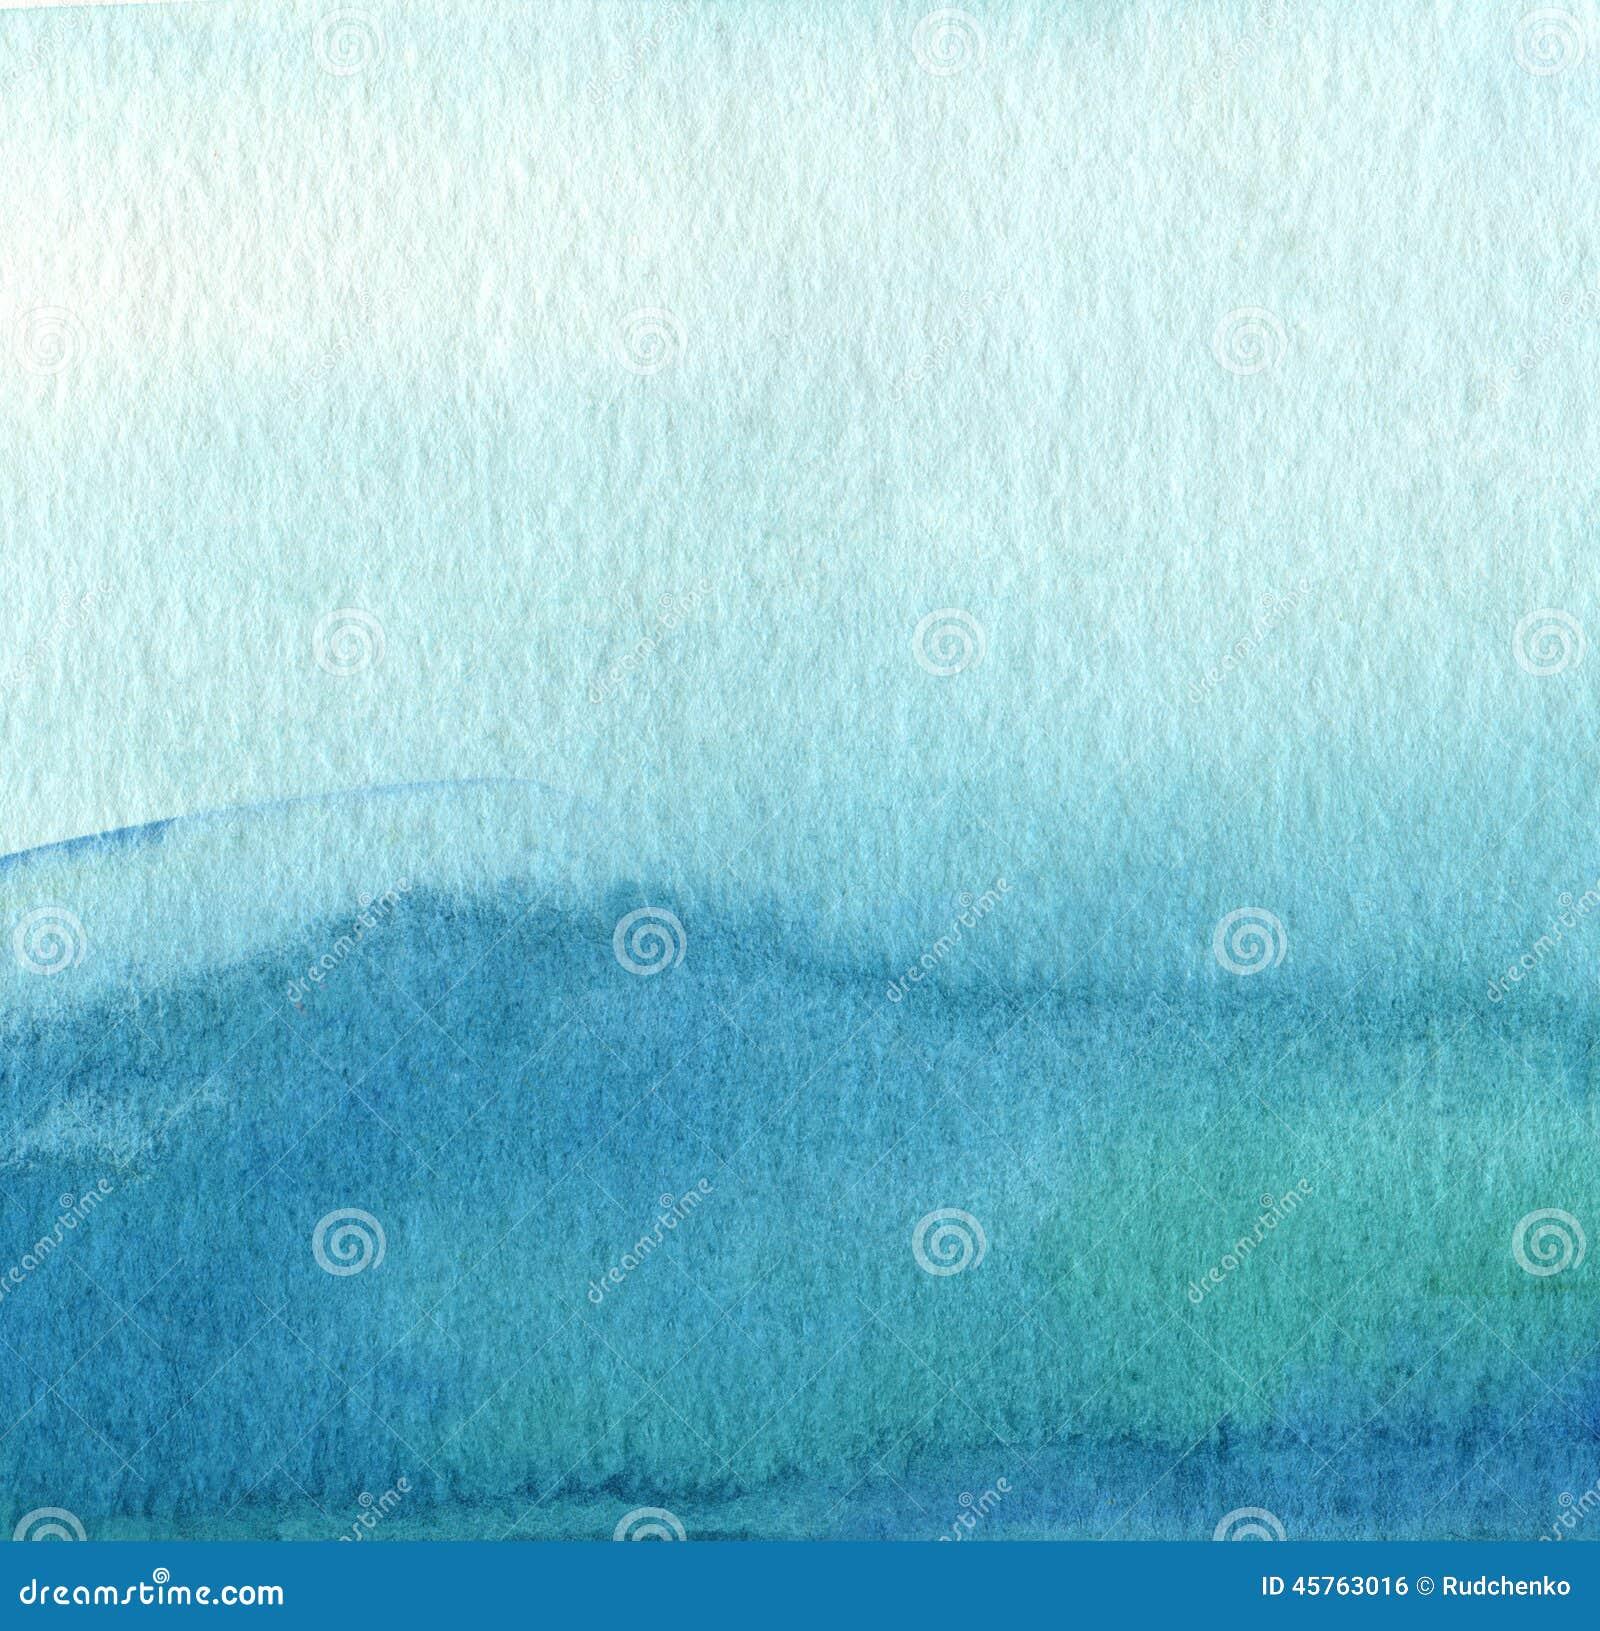 Abstracte blauwe waterverf geschilderde achtergrond